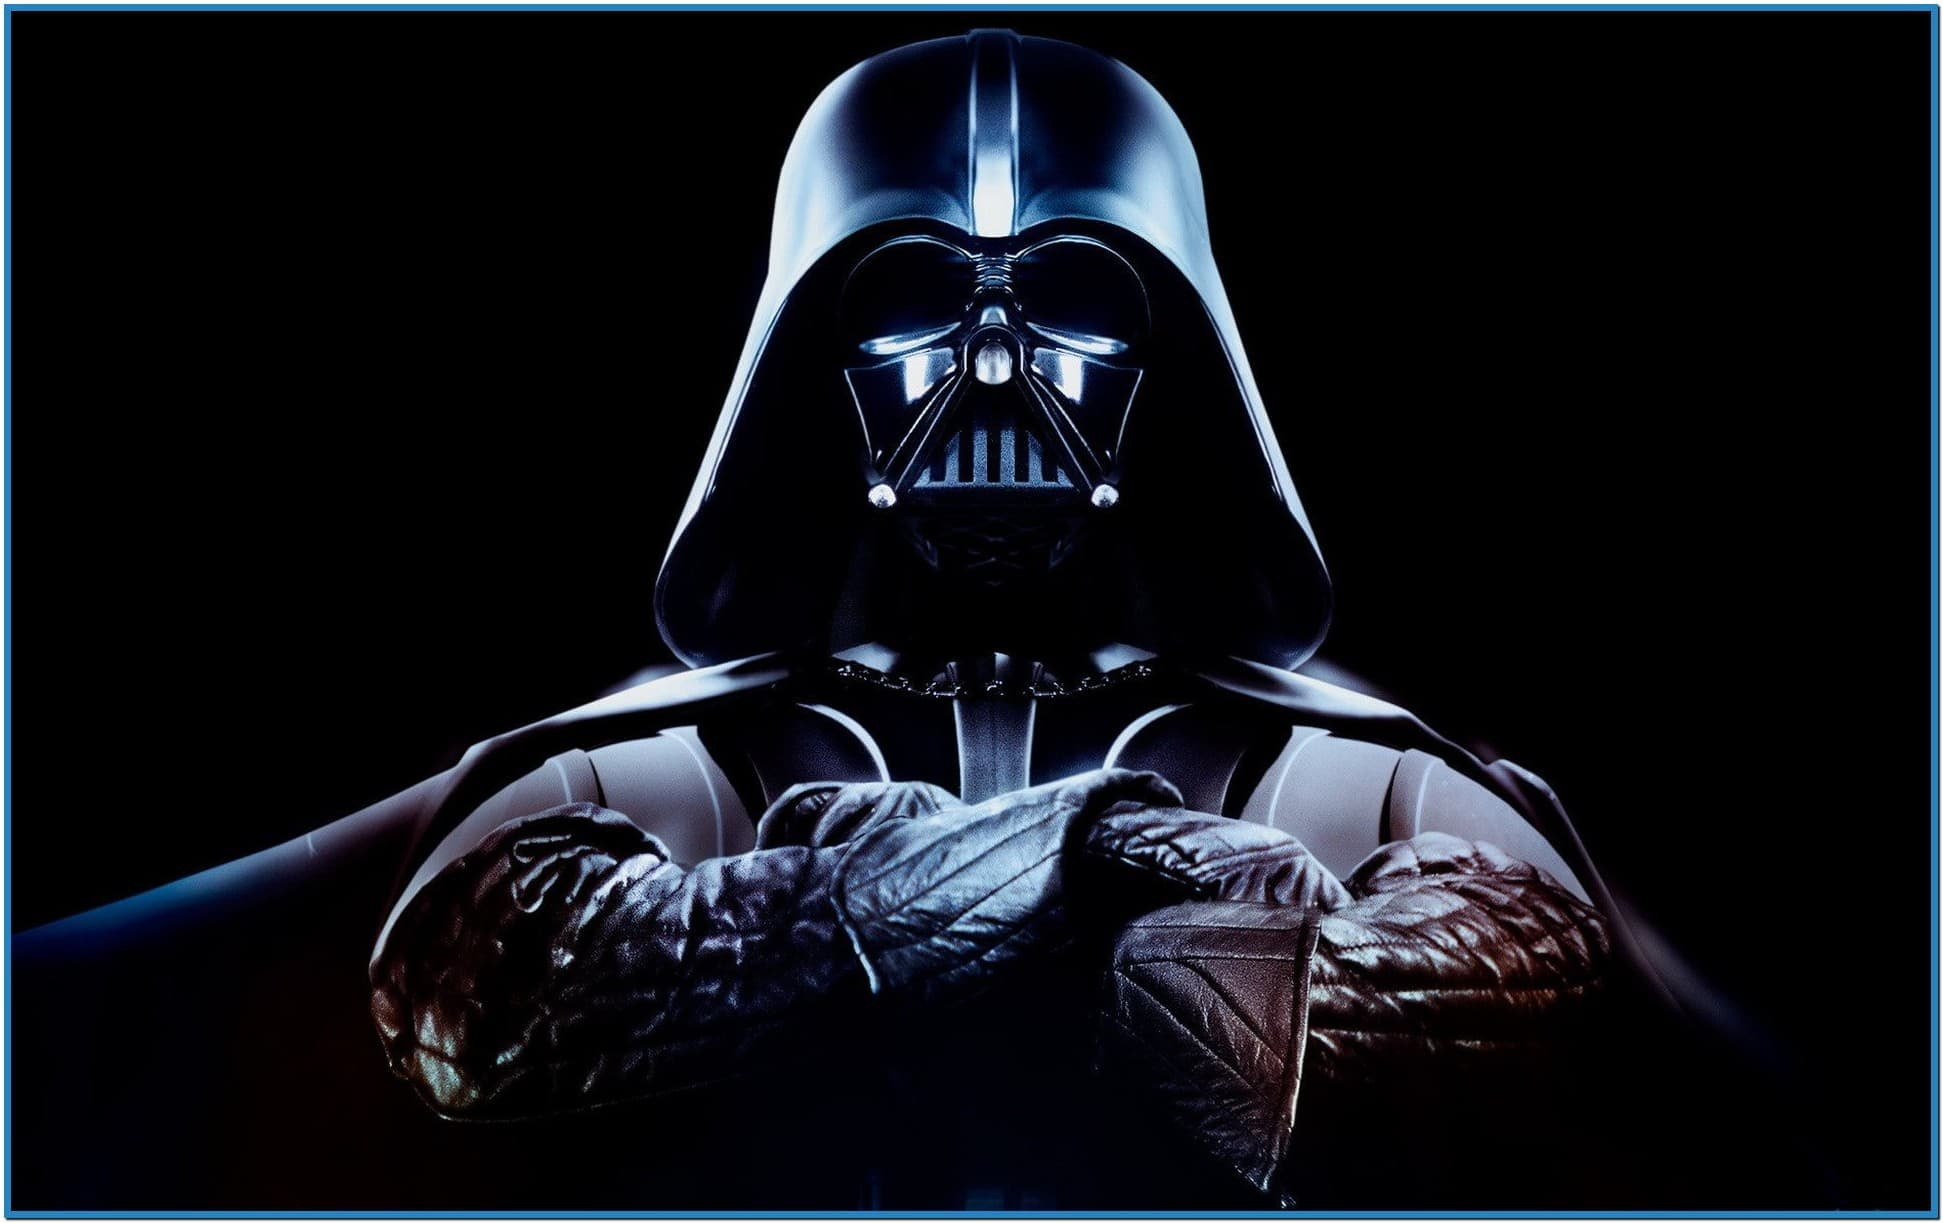 Star wars screensaver and wallpaper   Download 1943x1223